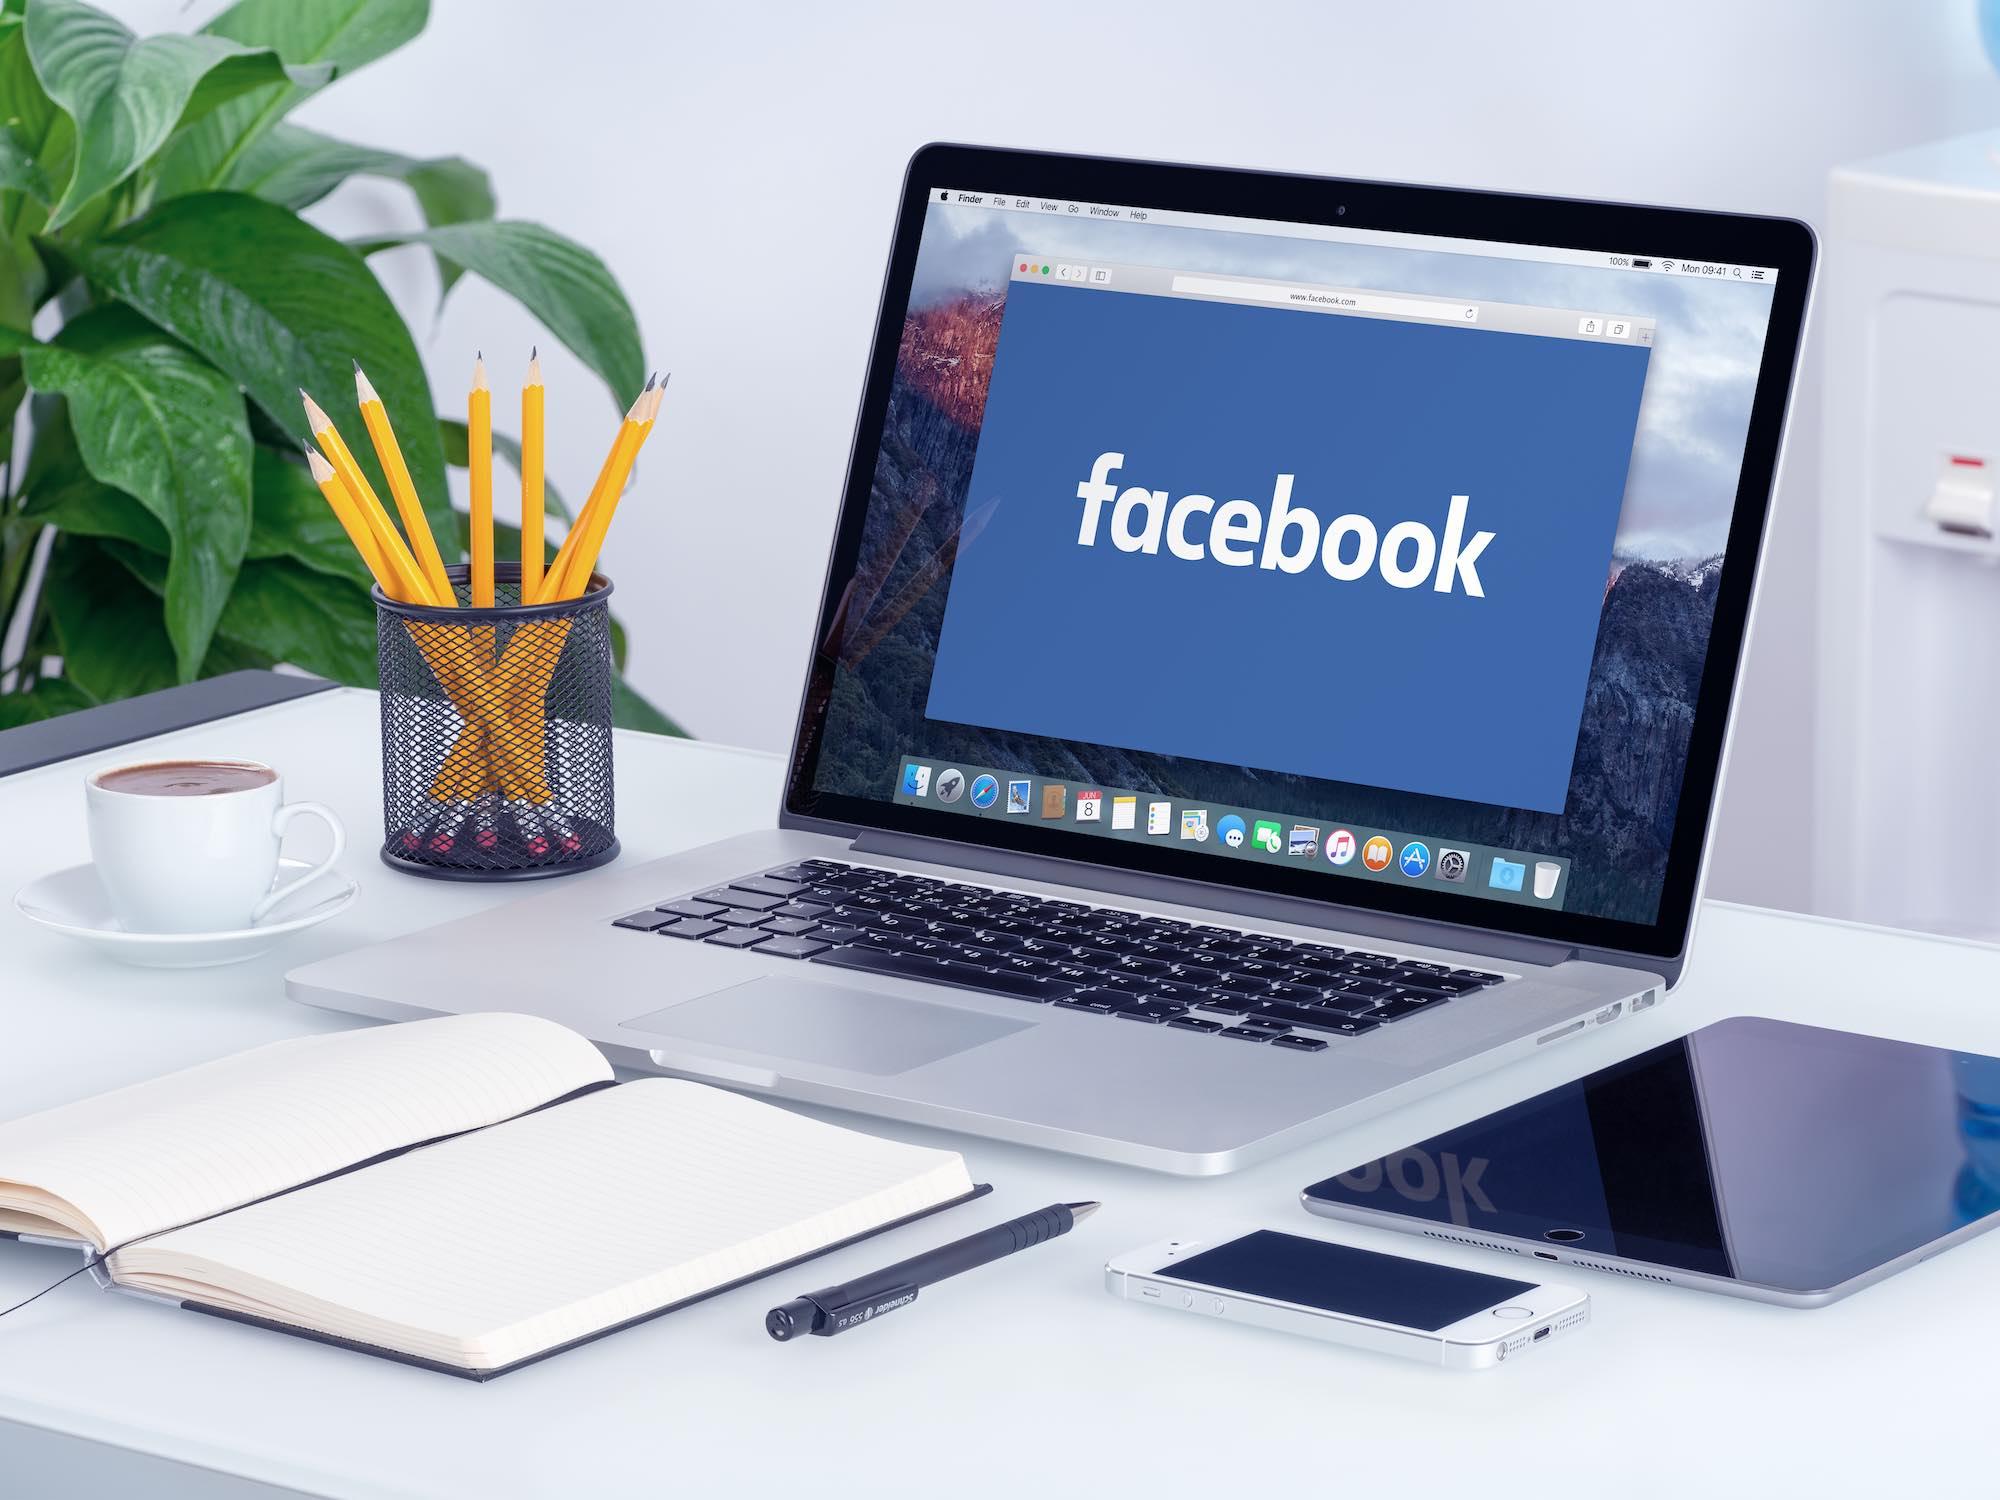 facebook off activity